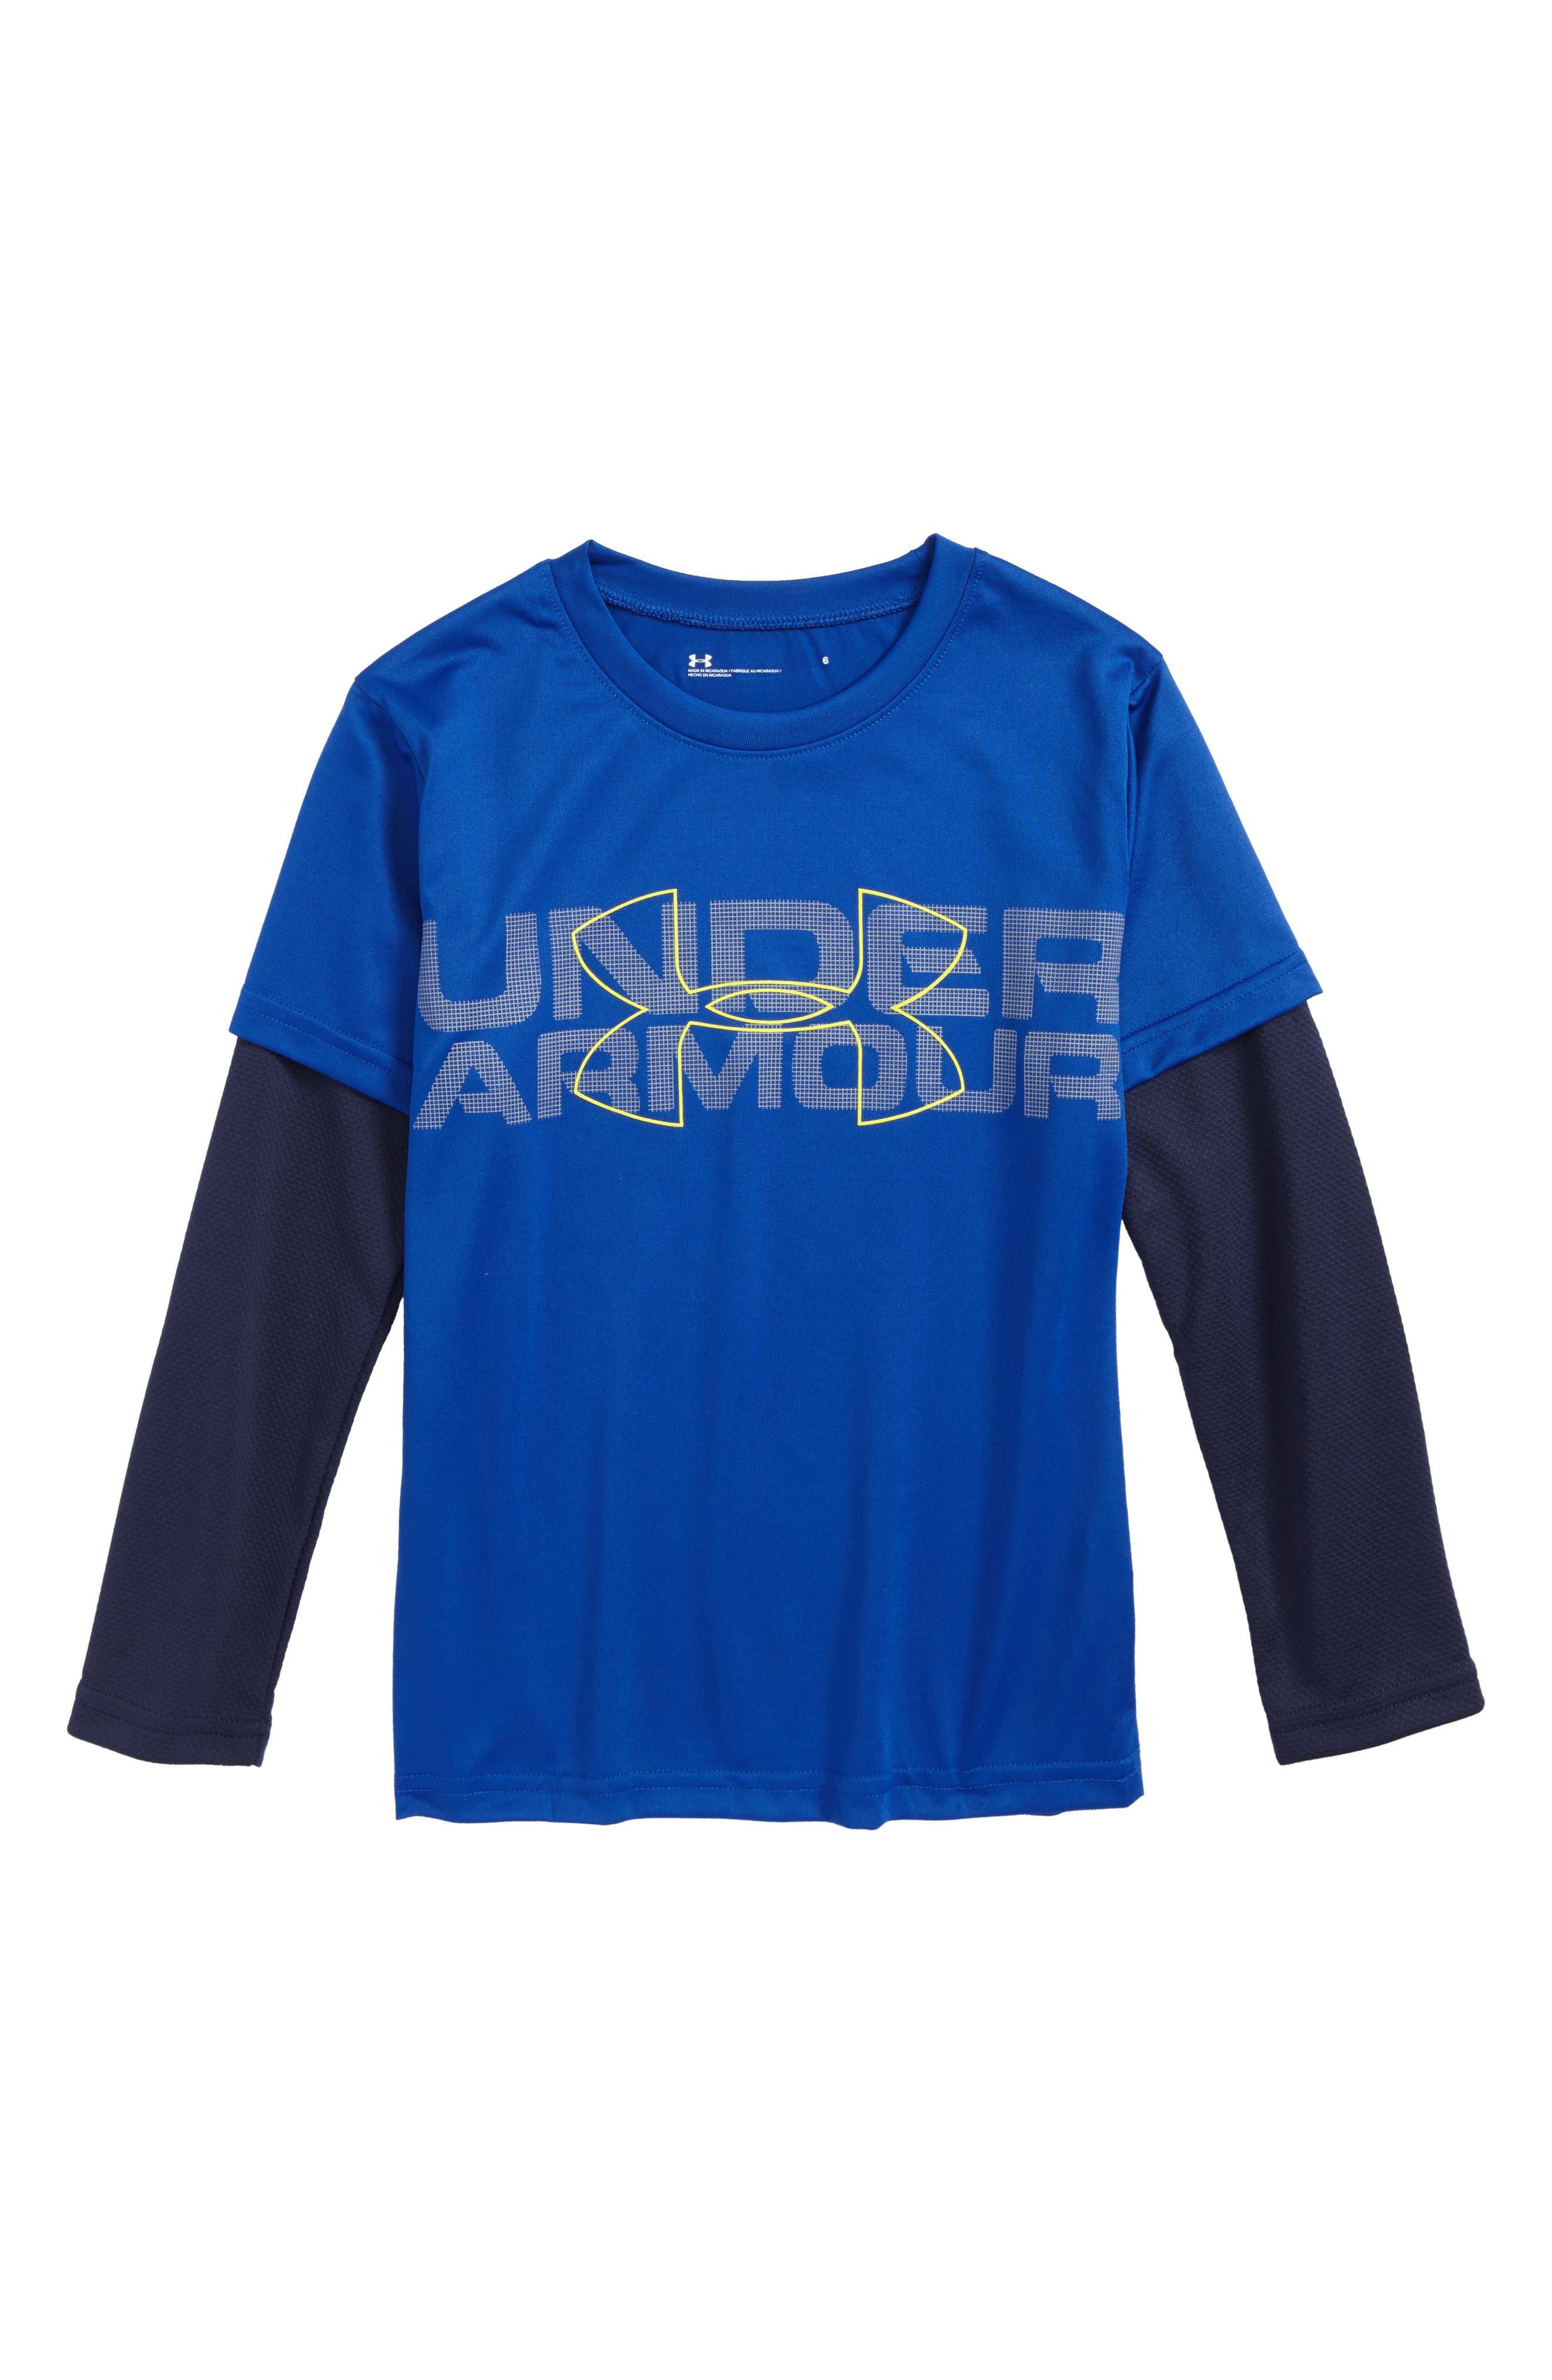 Alternate Image 1 Selected - Under Armour Wordmark Slider Layered T-Shirt (Toddler Boys & Little Boys)